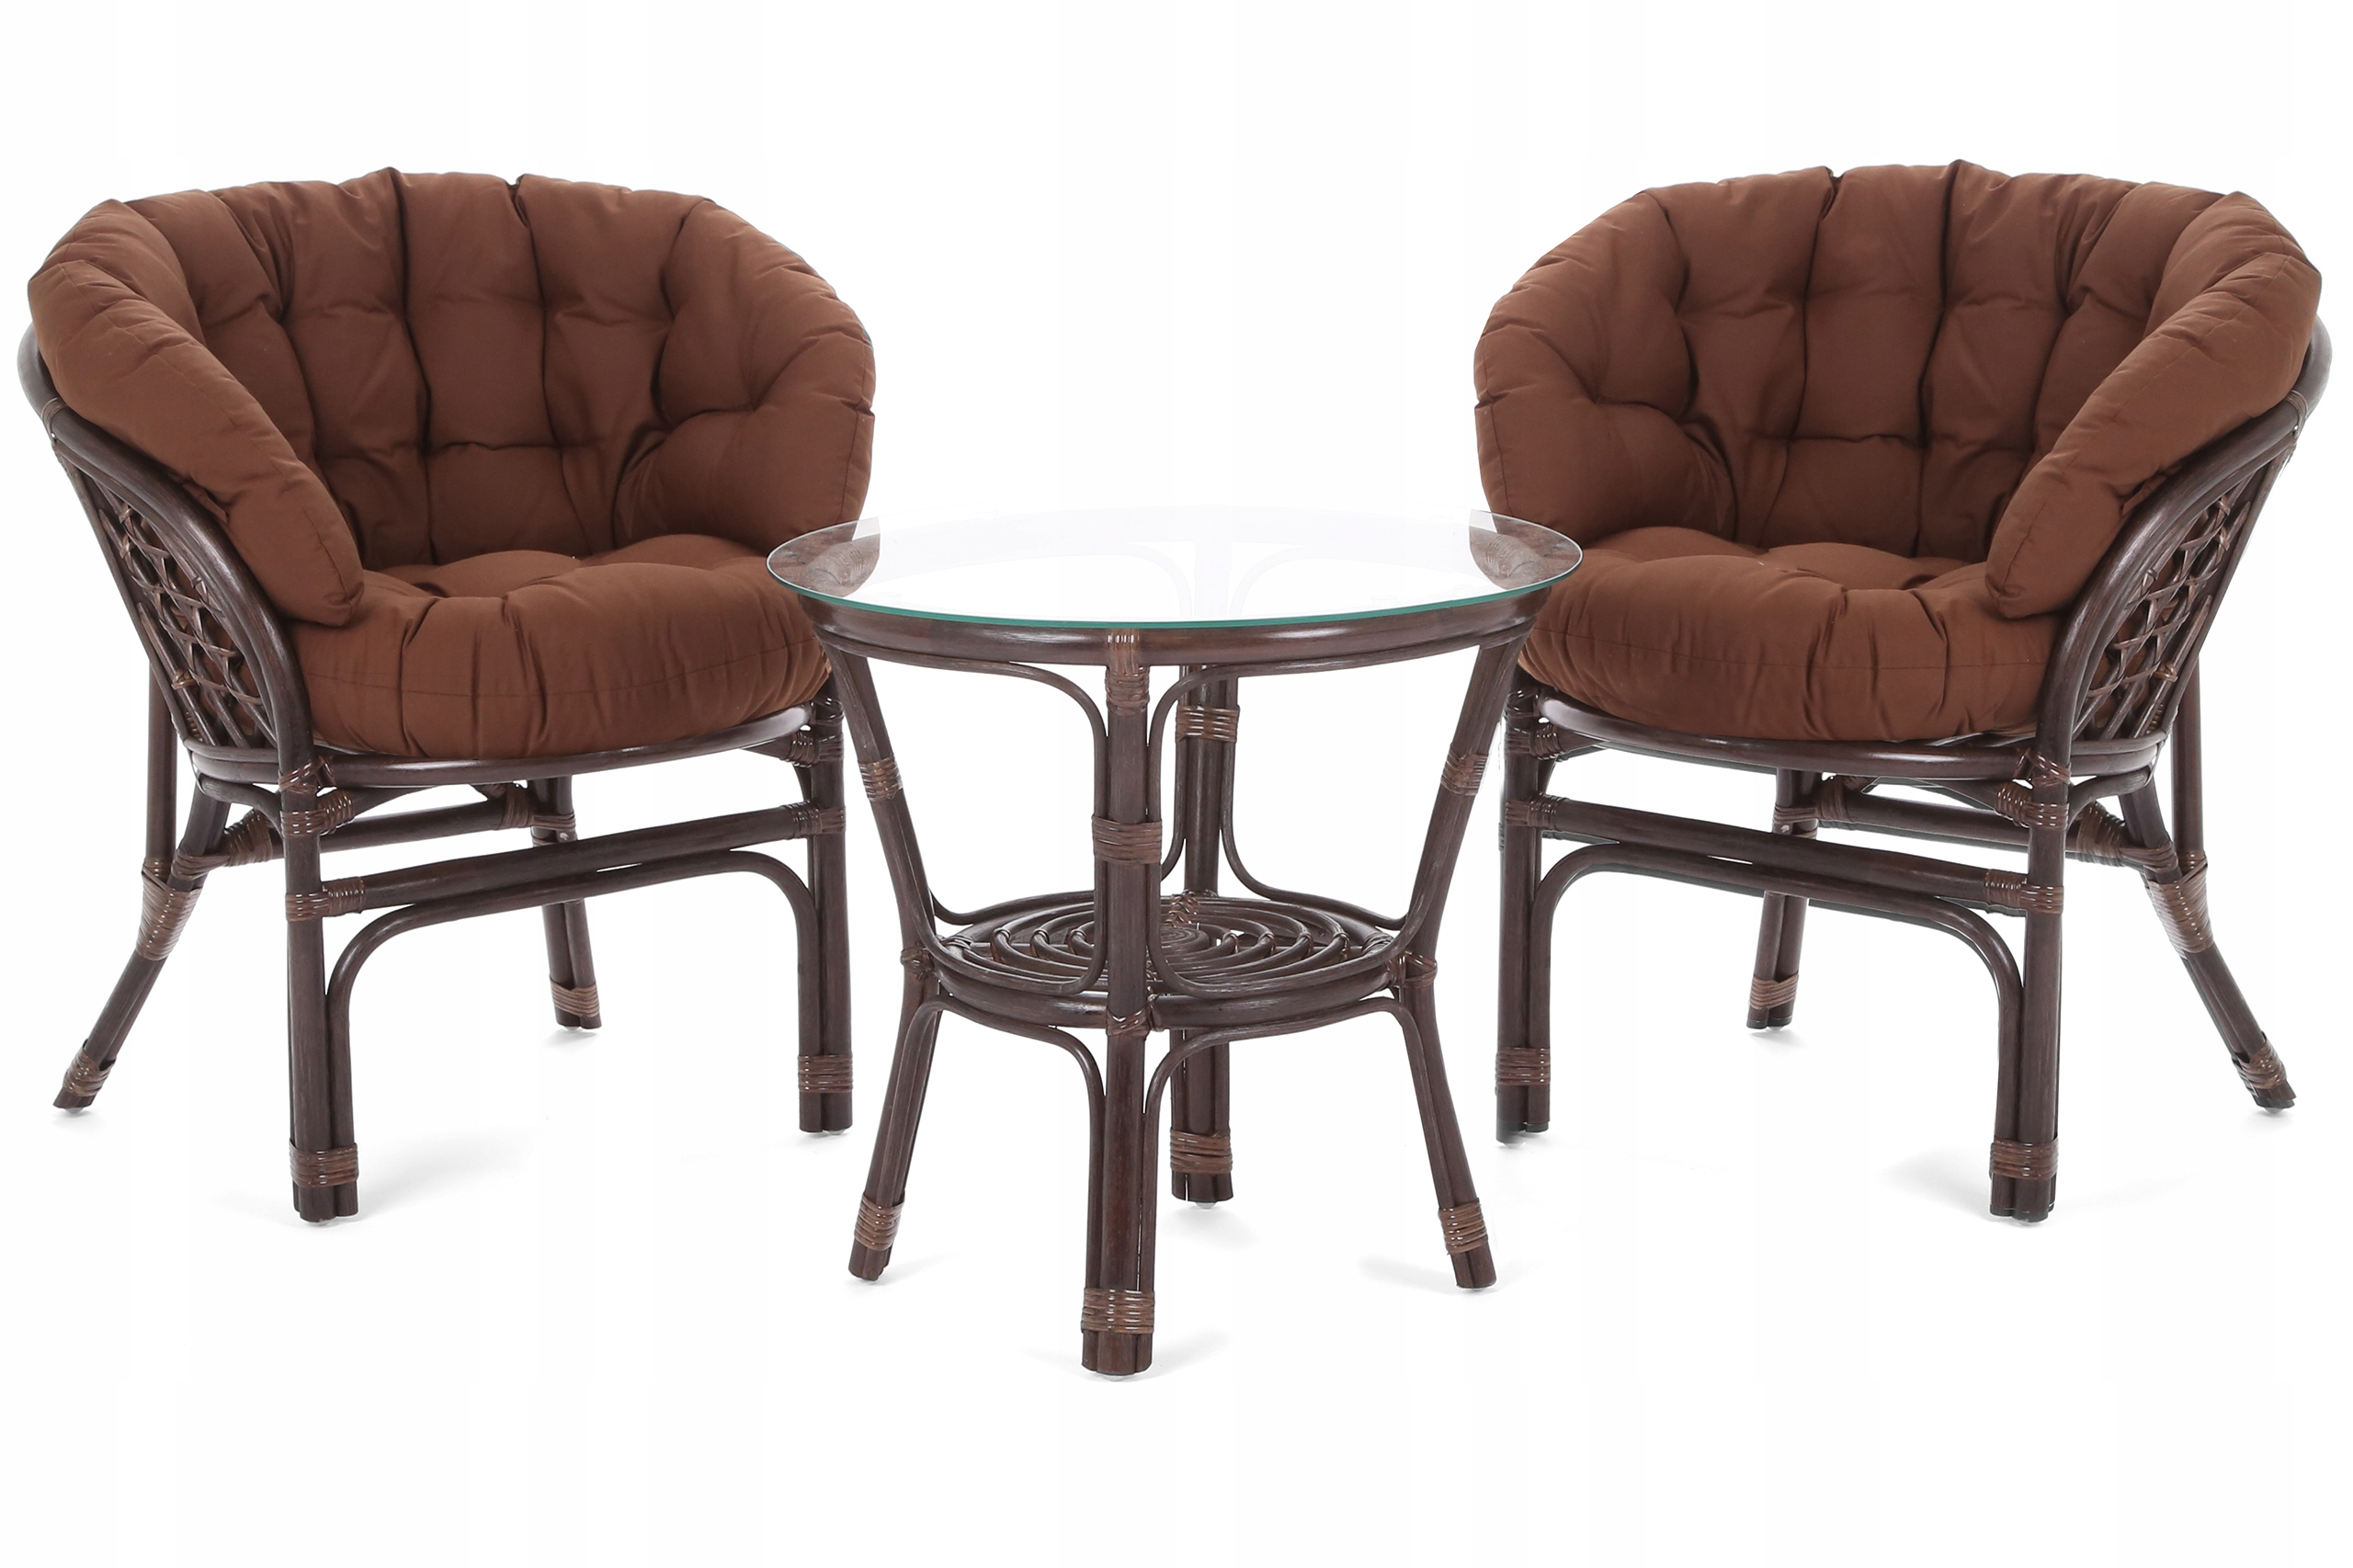 Nábytok ratanový nábytok BAHAMA HNEDÁ / BROWN 2+1